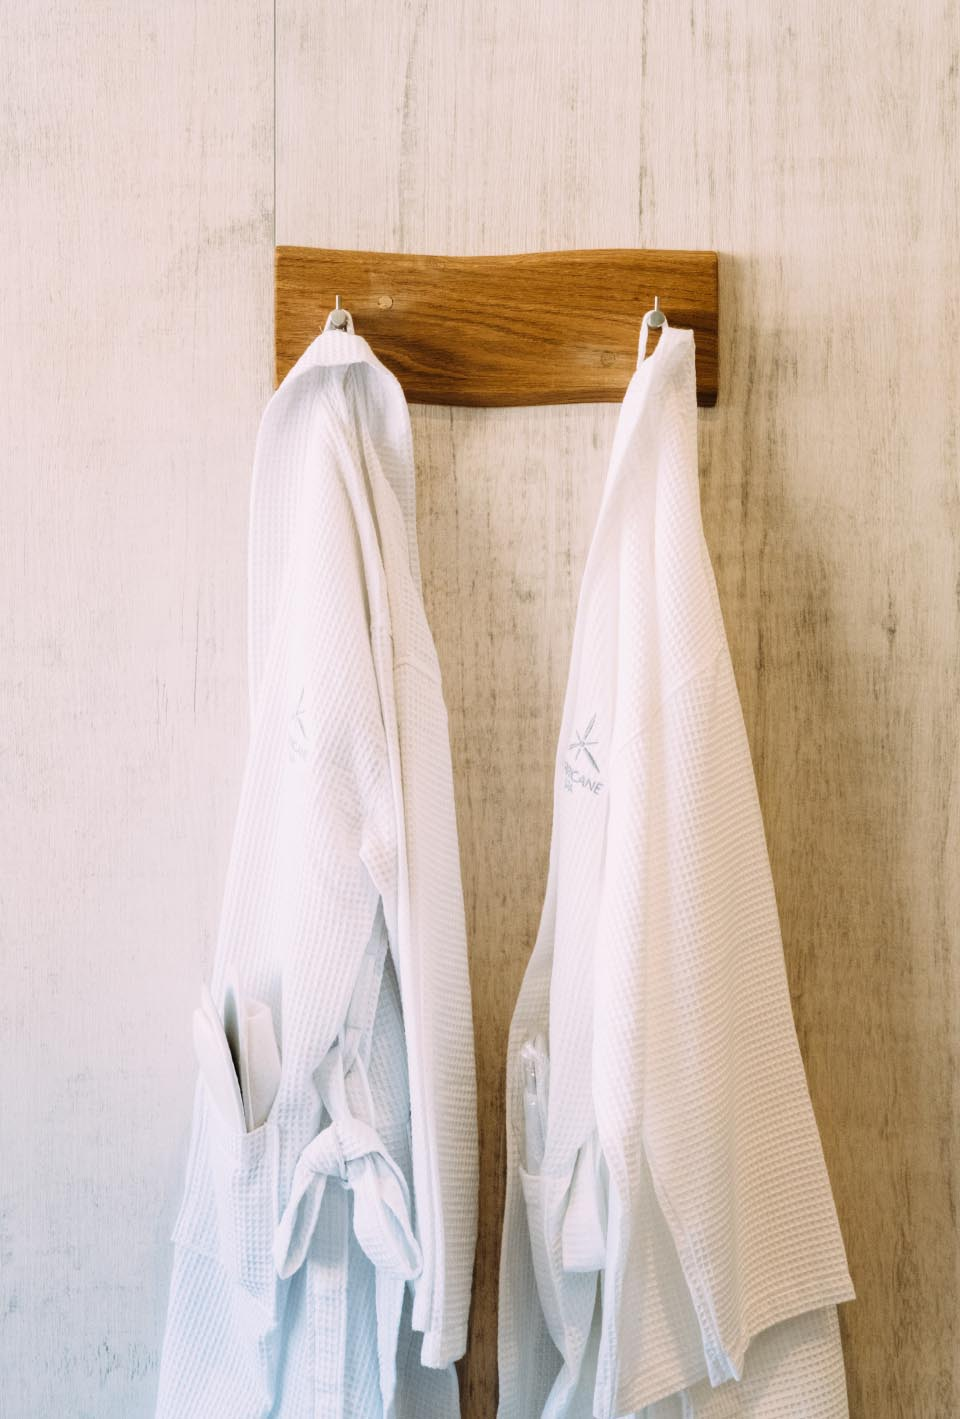 Silverlake-Butterscotch-design-Spa-rustic-robe-hook